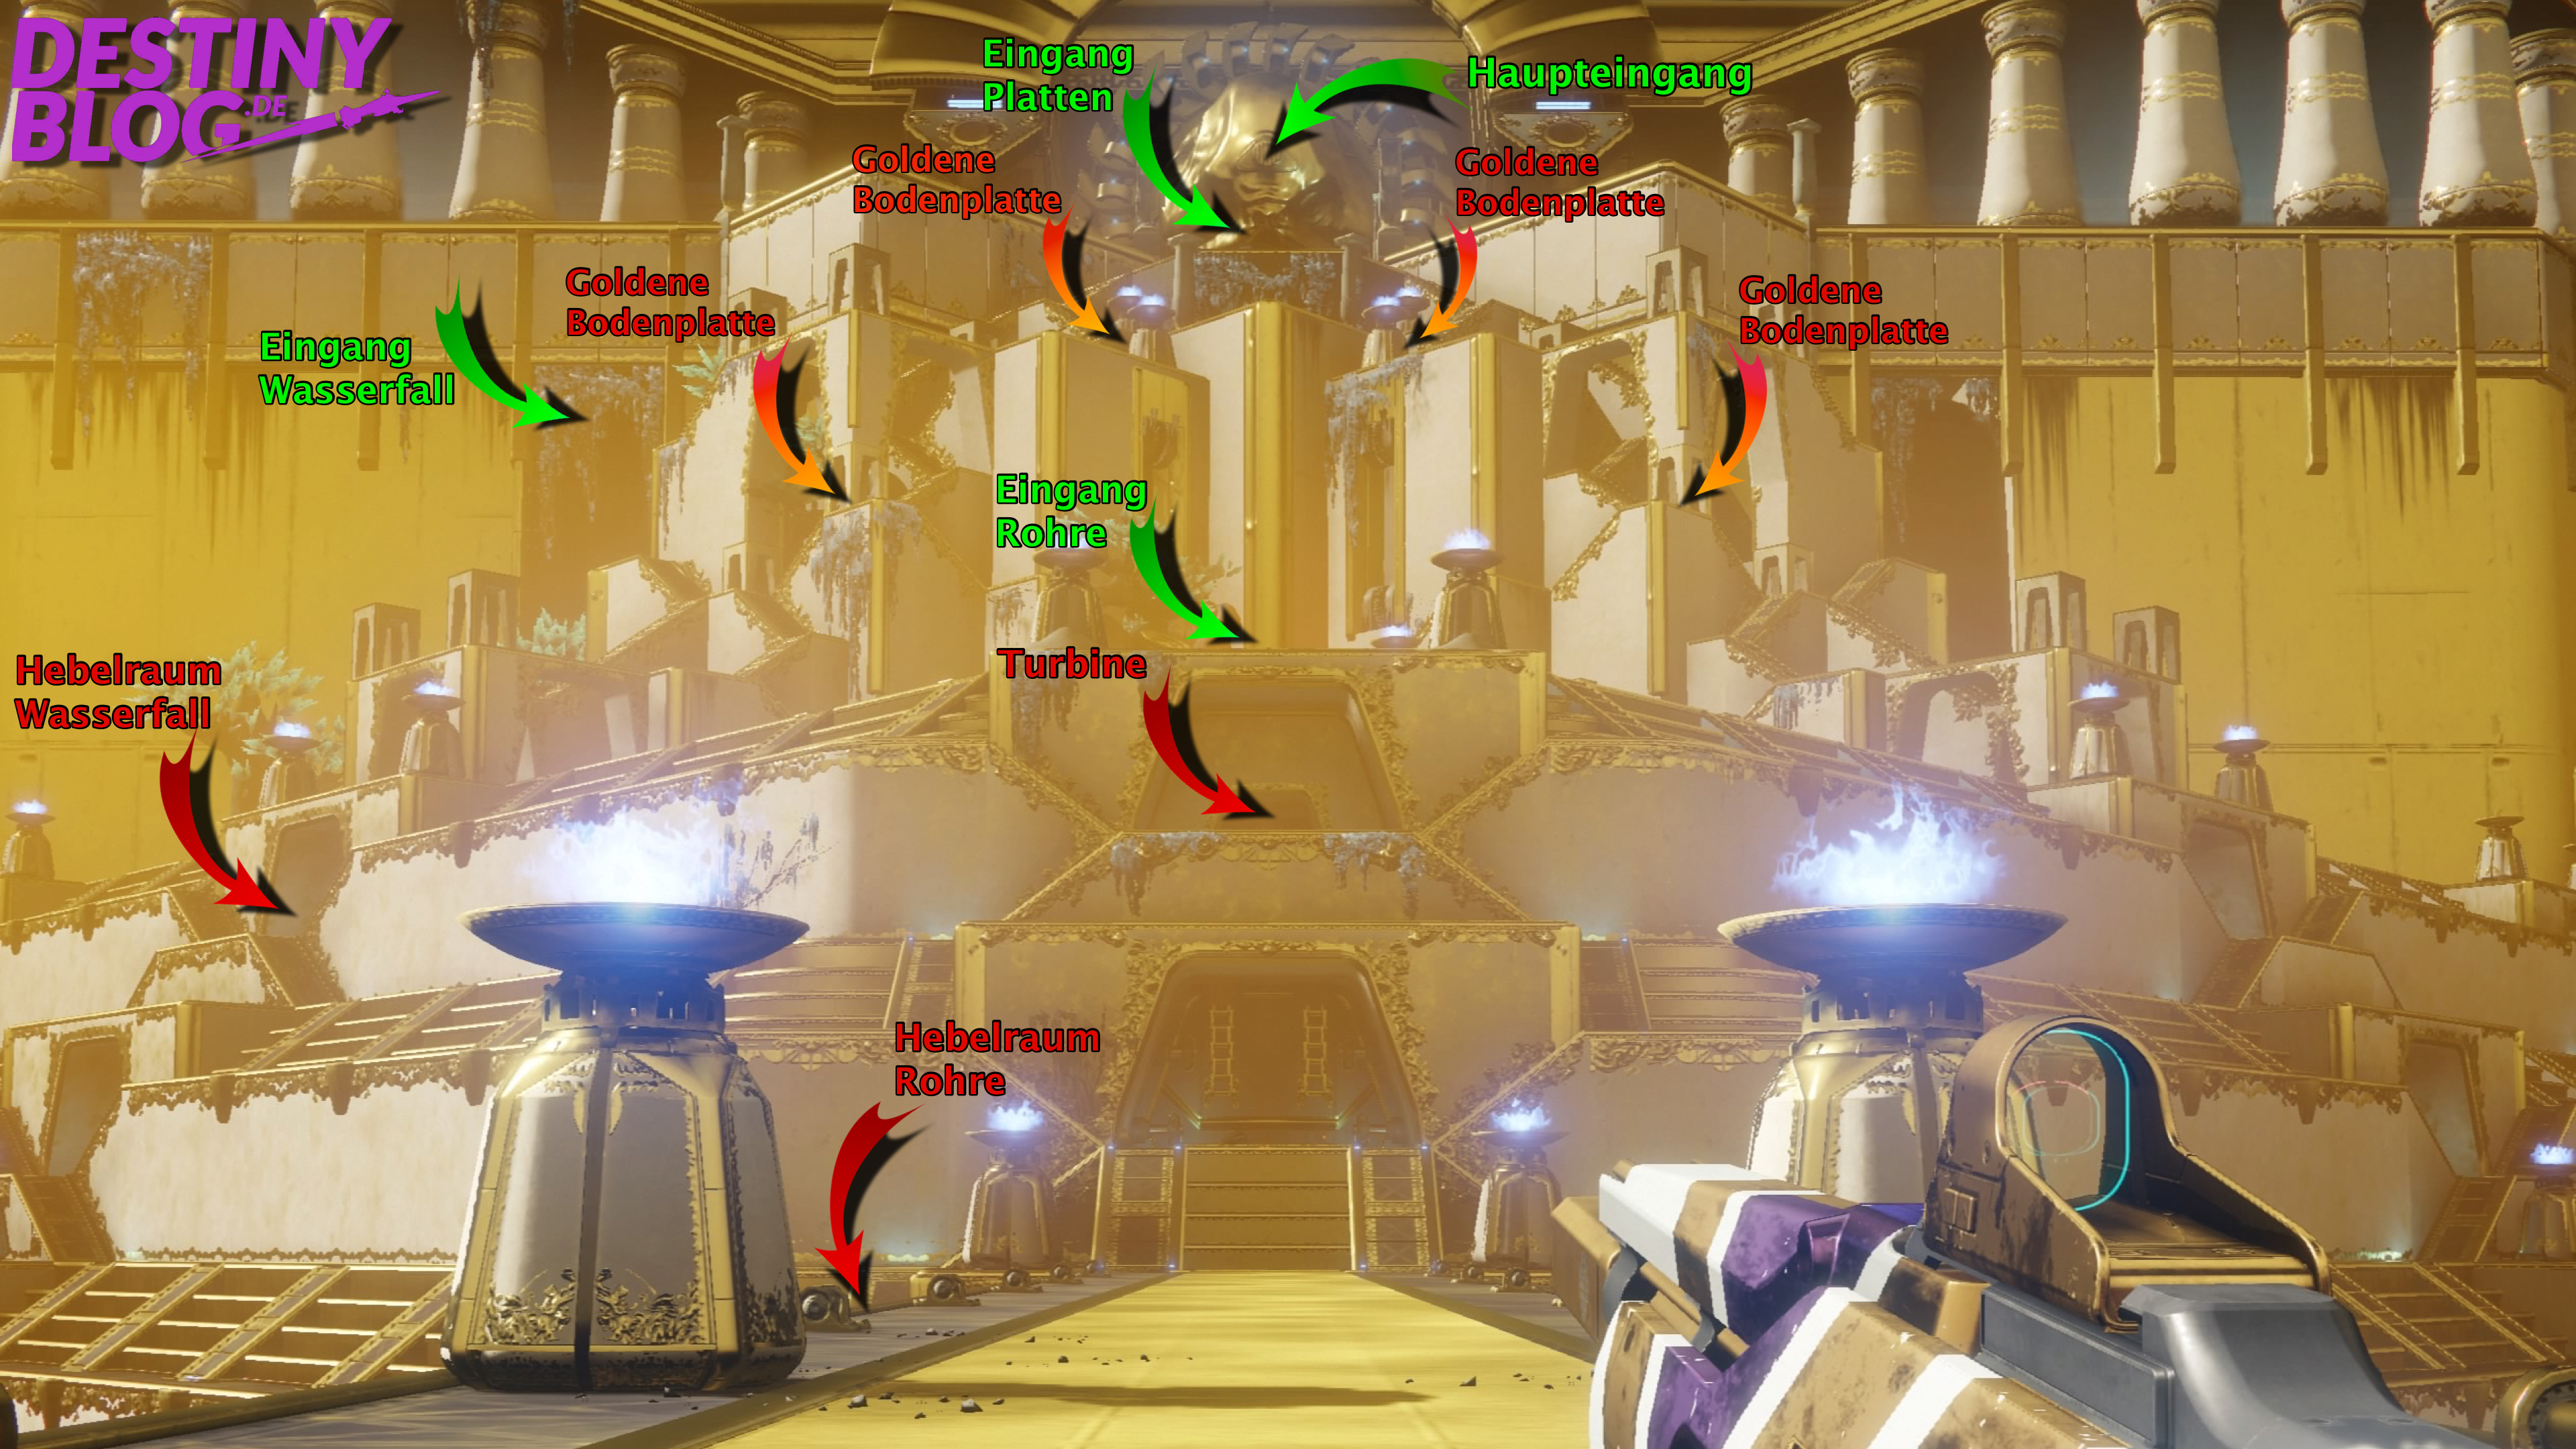 Destiny 2 Raid Karte.Destiny 2 Leviathan Raid Guide Labyrinth Im Unterbauch